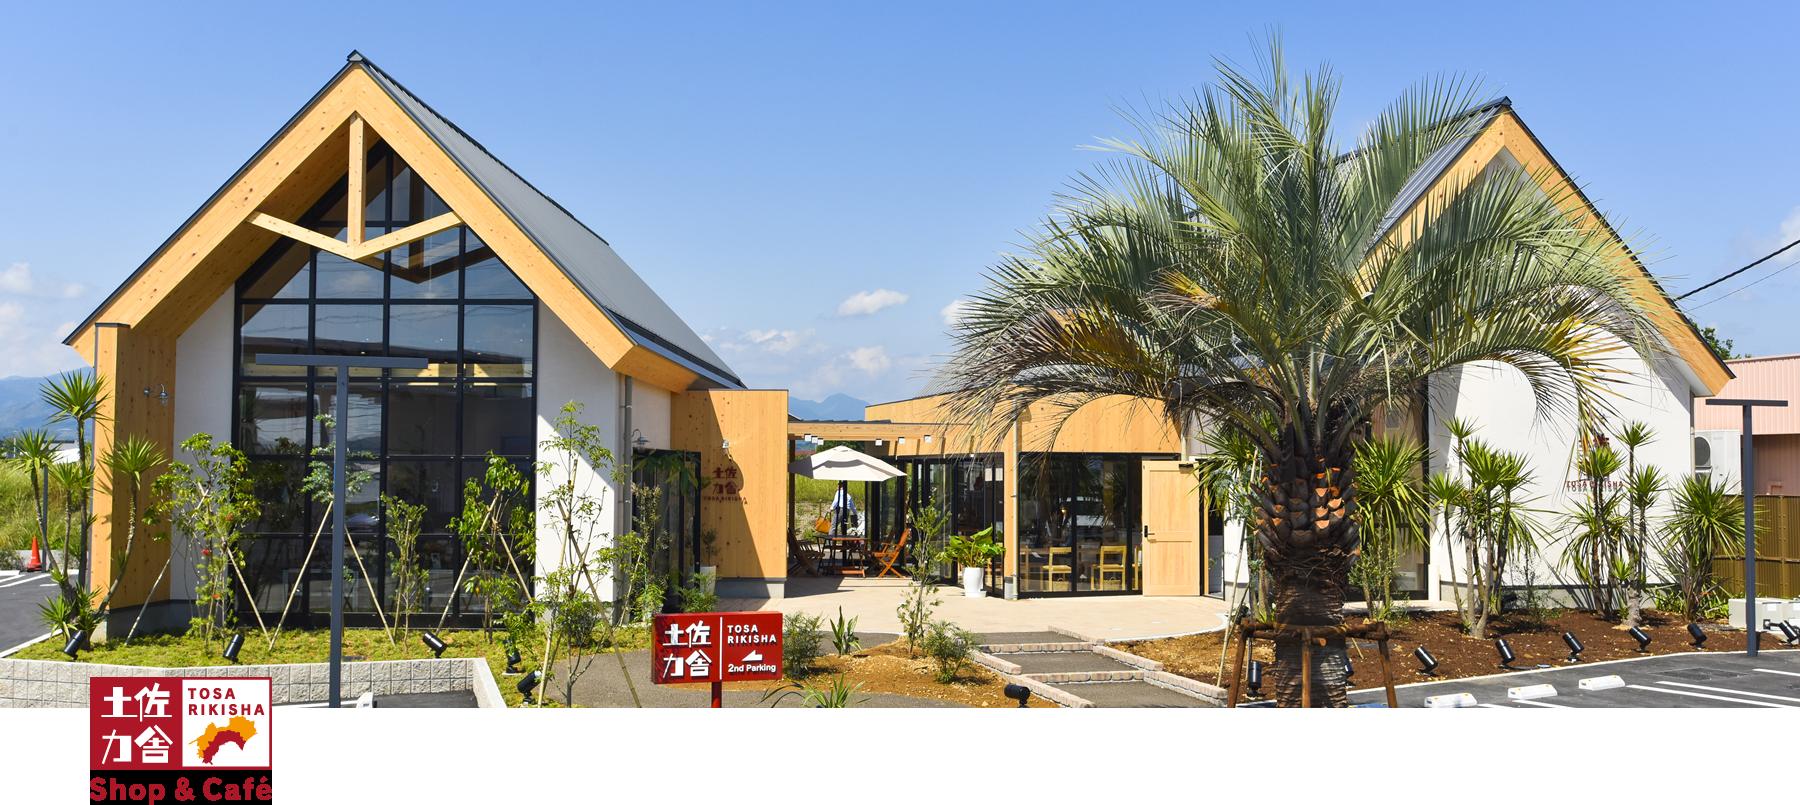 土佐力舎 Shop&Cafe